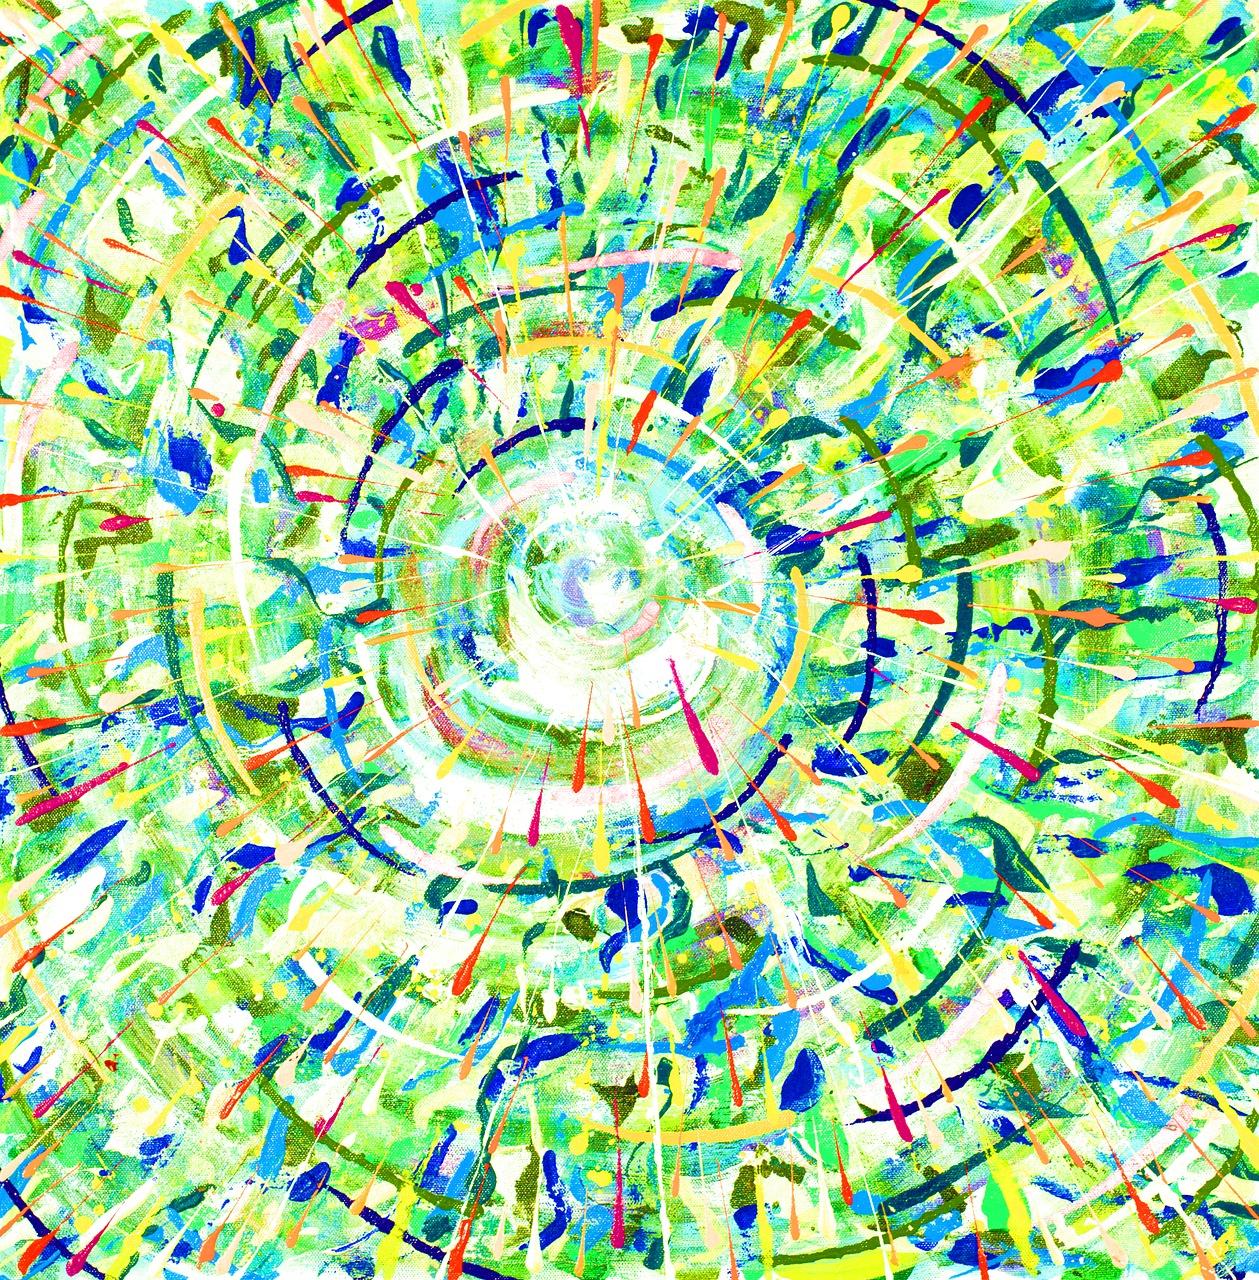 Modern Contemporary Art - Free image on Pixabay